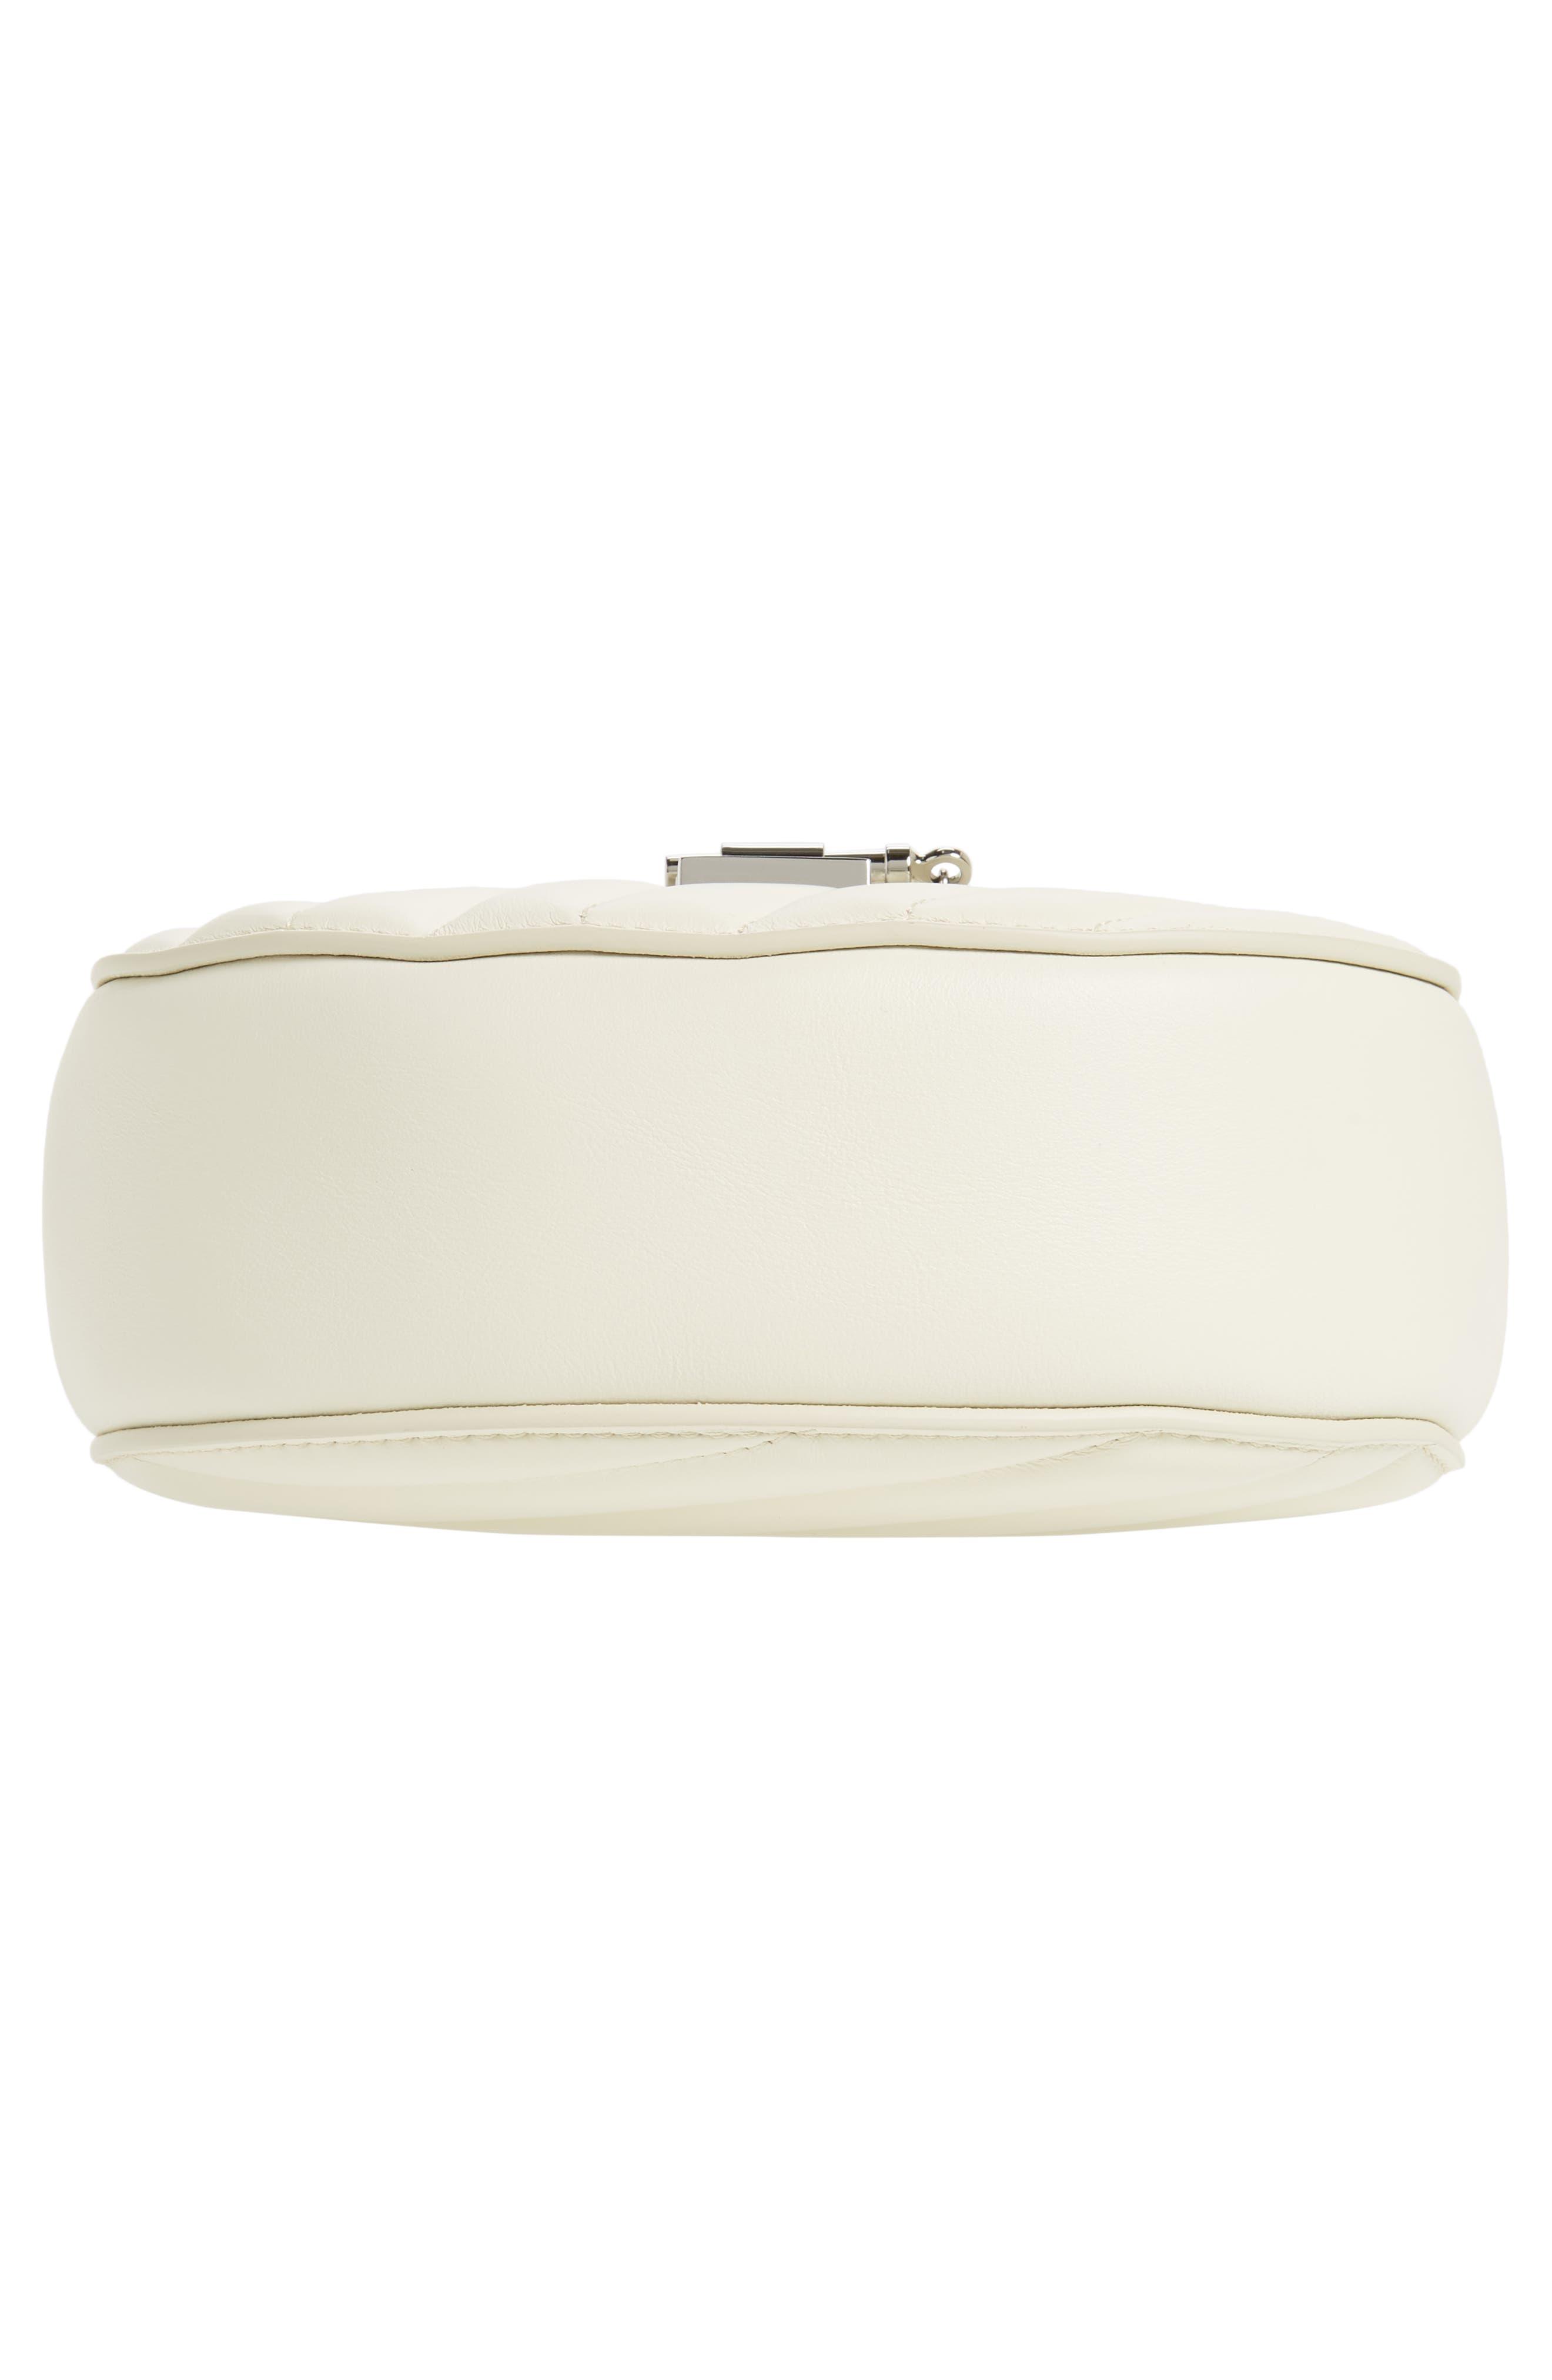 Mini Drew Bijoux Leather Shoulder Bag,                             Alternate thumbnail 10, color,                             Natural White